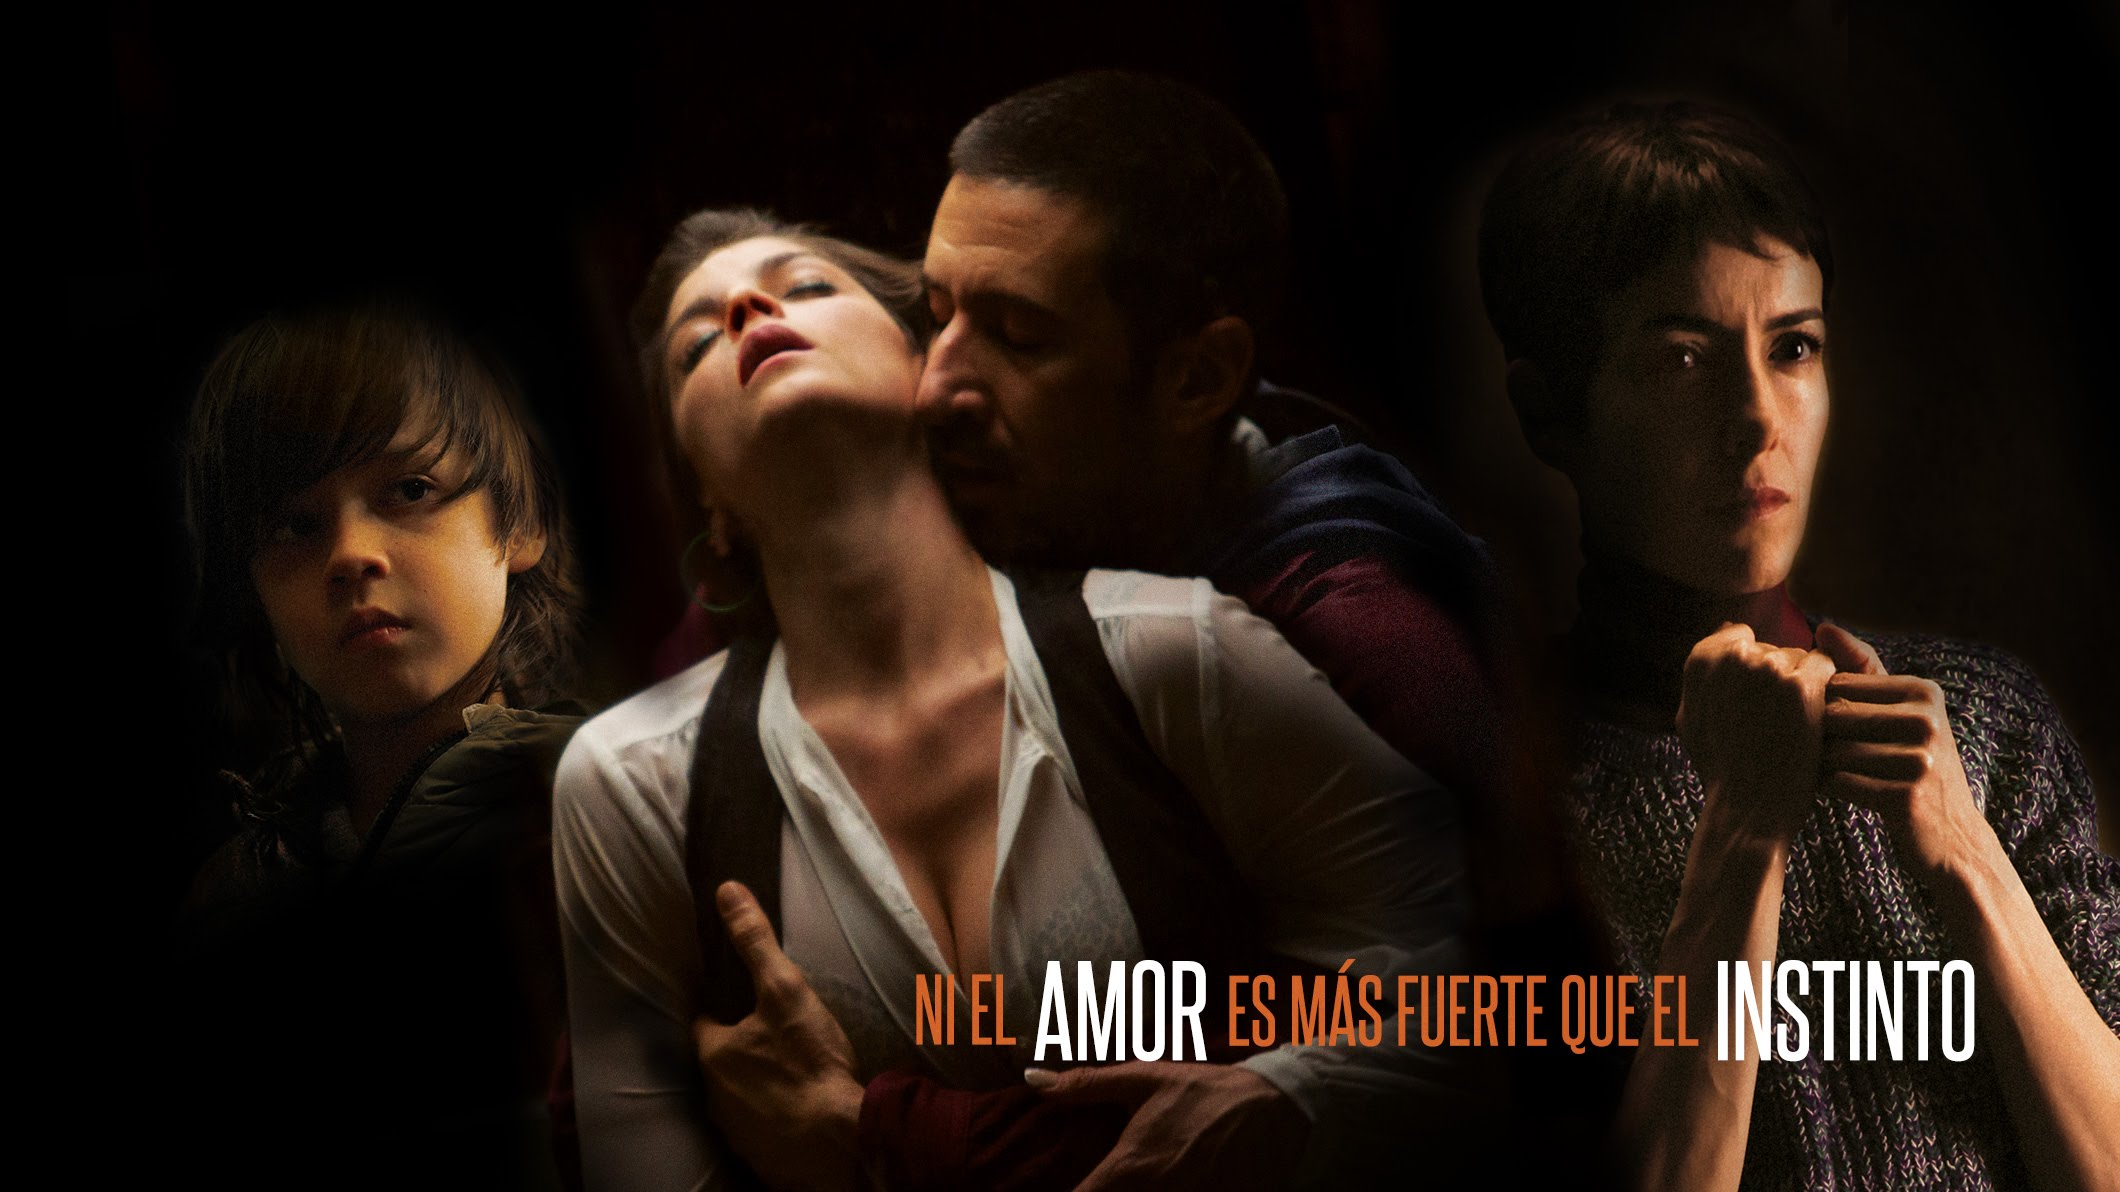 Oscuras Primaveras Entrevista Con Irene Azuela Ivital